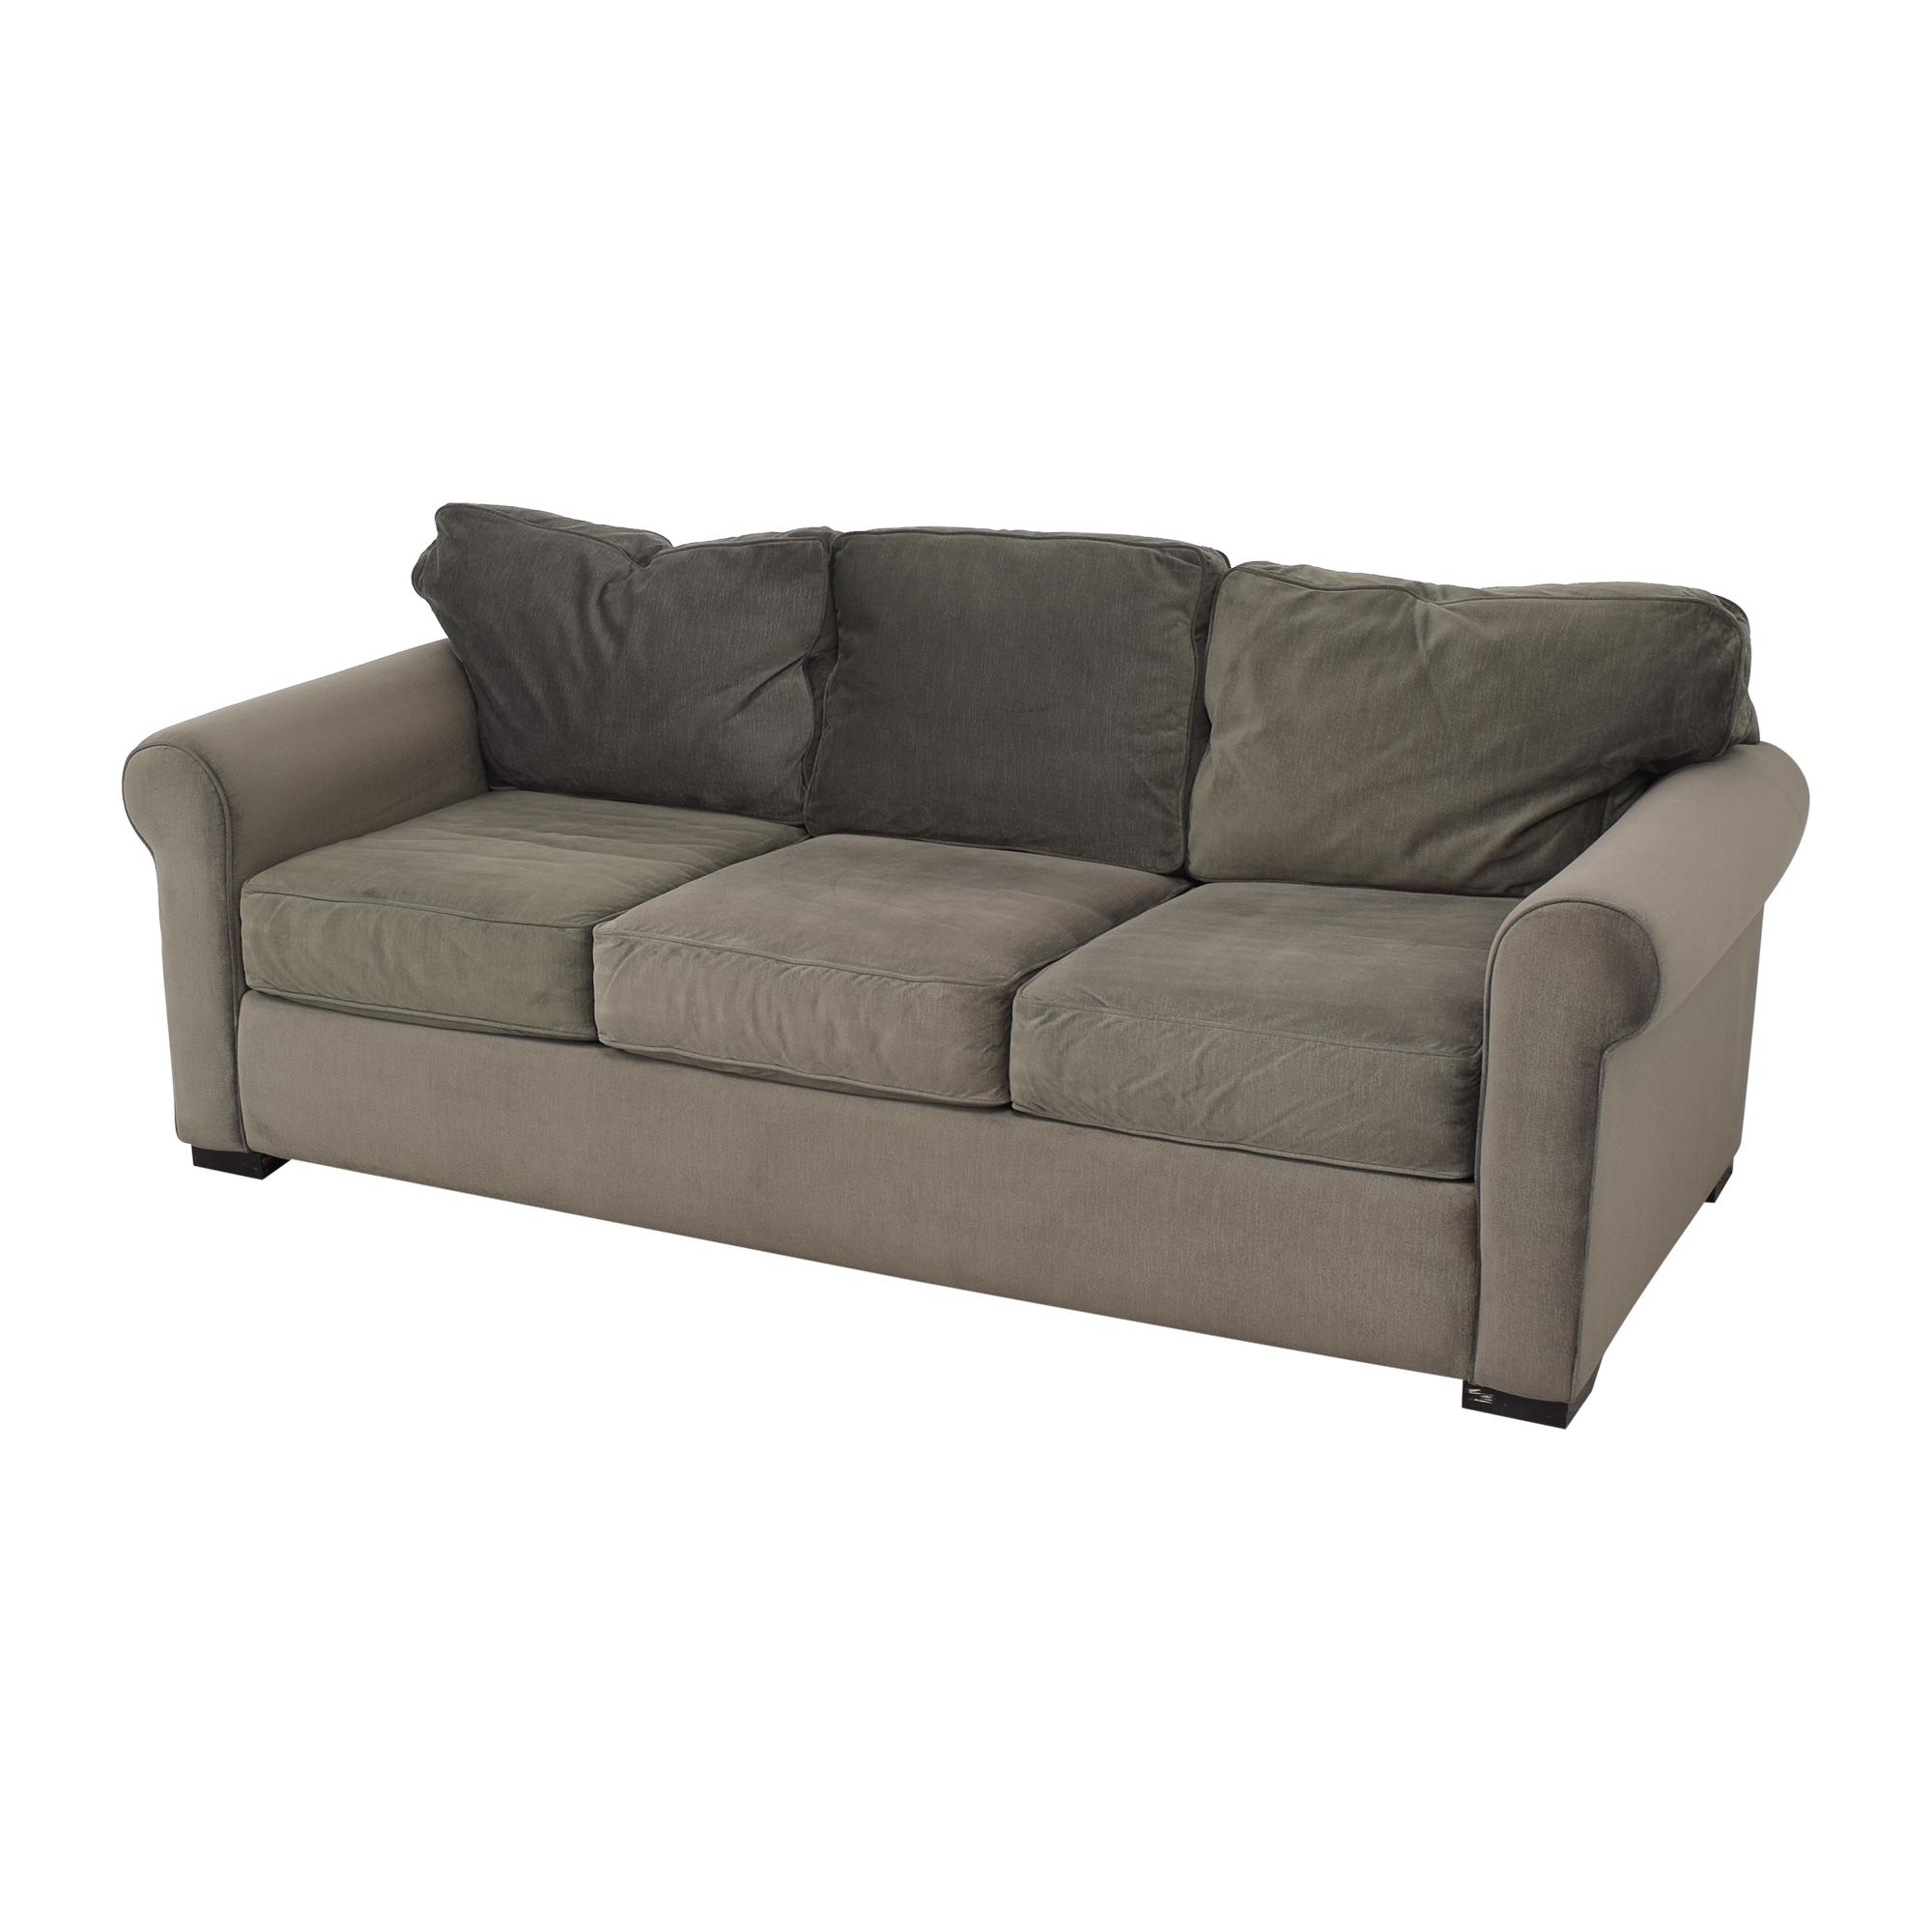 Jonathan Louis Rolled Arm Sofa sale